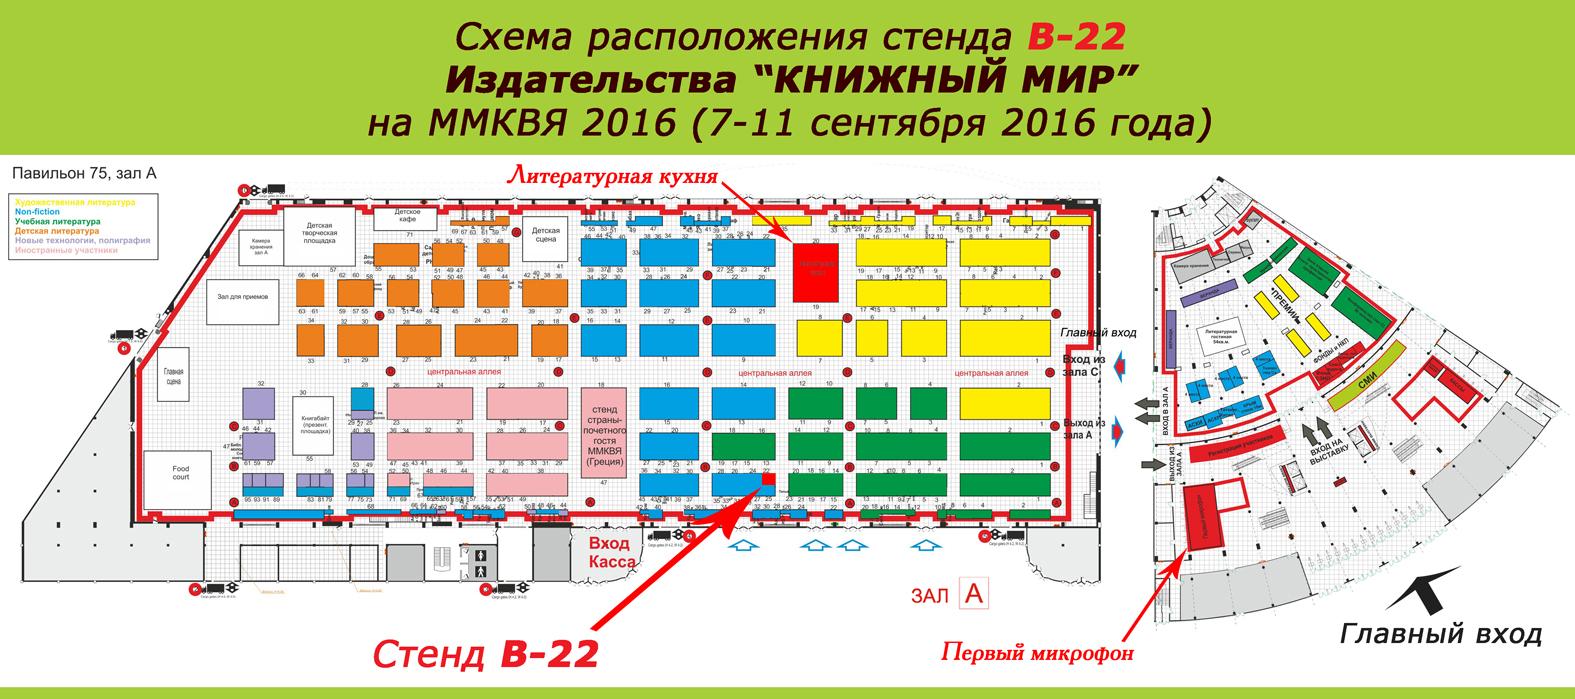 Схема залов в 75 павильоне